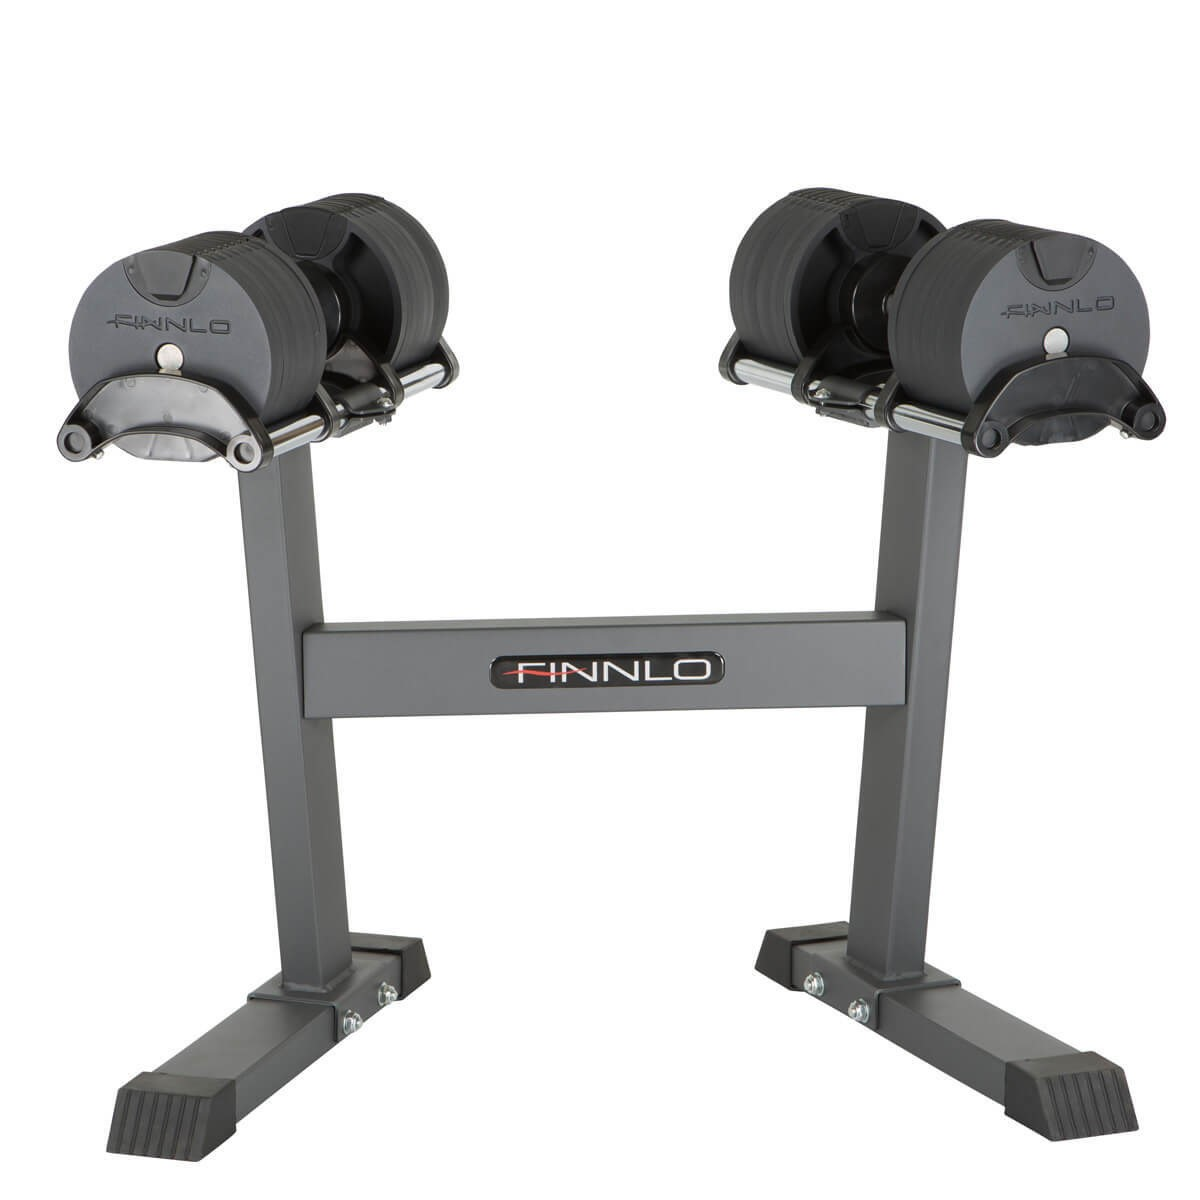 Finnlo SmartLock Verstelbare Dumbbell Set inclusief Opbergrek - 2 x 32 kg